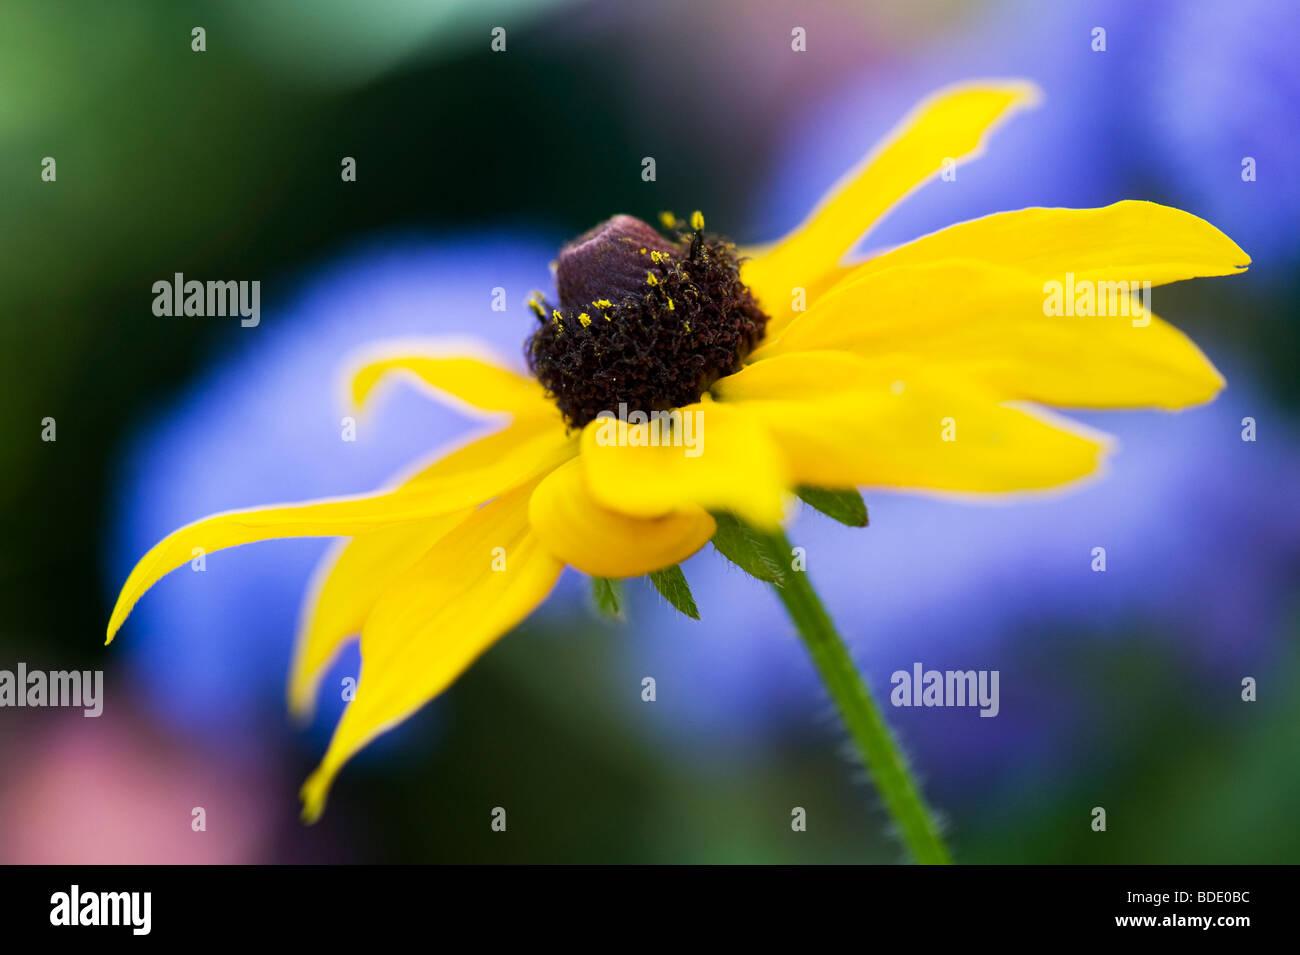 Rudbeckia fulgida Goldsturm flower against blue background in a garden - Stock Image